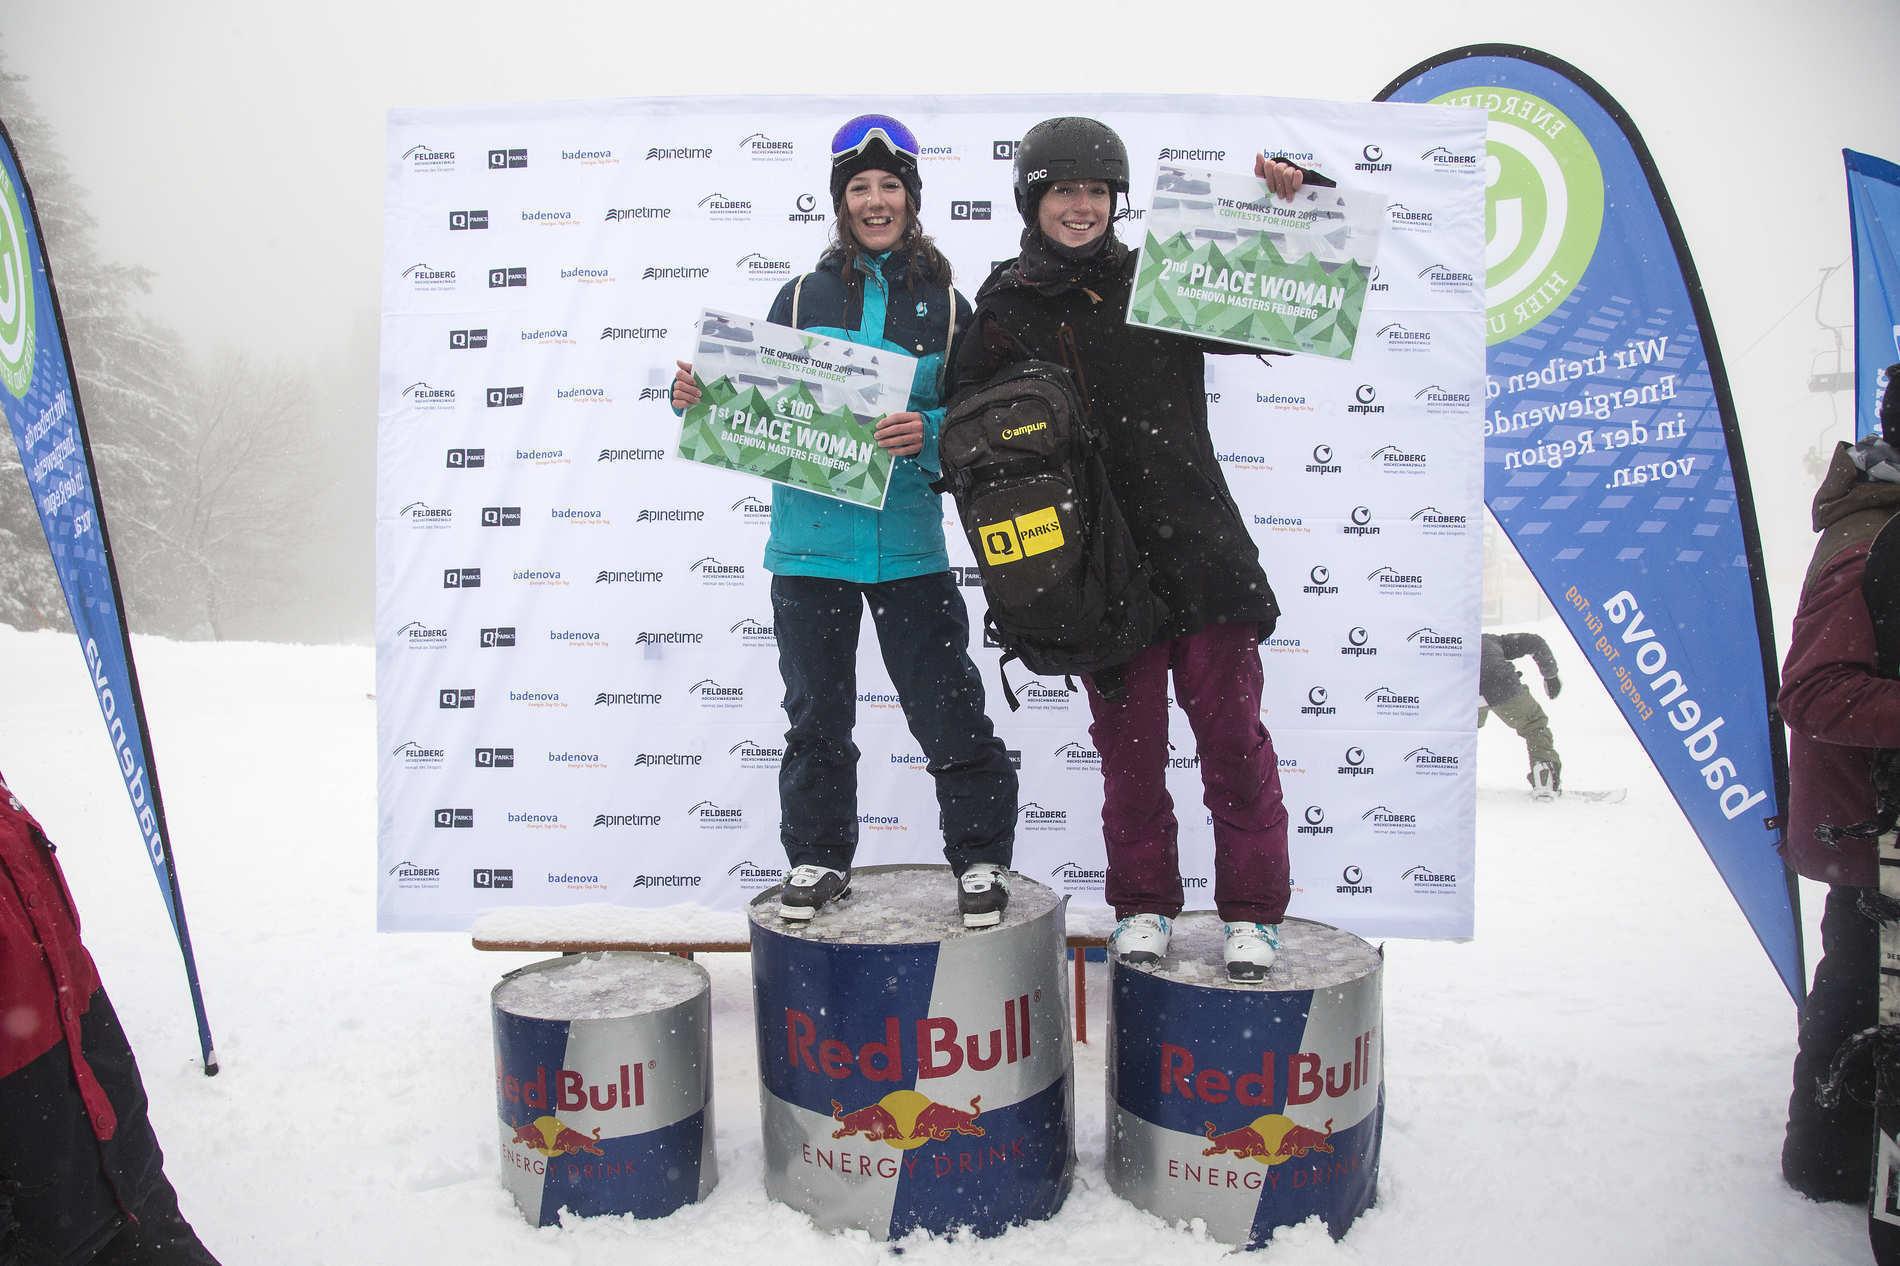 web snowpark feldberg 17 02 2018 lifestyle fs sb martin herrmann qparks 9